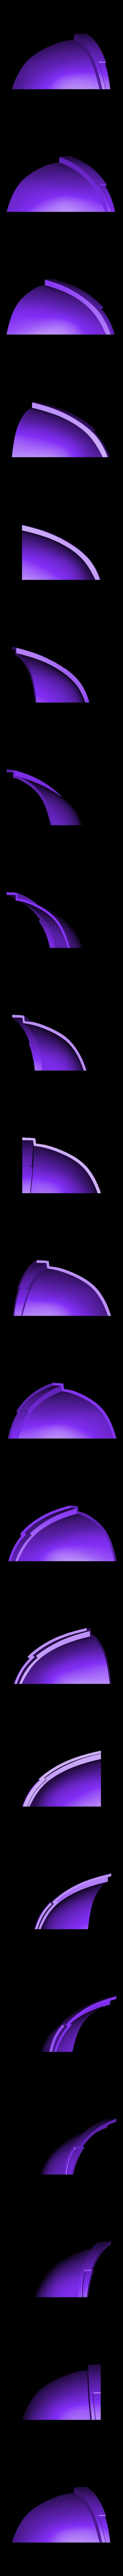 Part_1_v4.stl Download free STL file  Blood Dragon Helmet Mass Effect 2 (With Back Access) • 3D printable template, VillainousPropShop